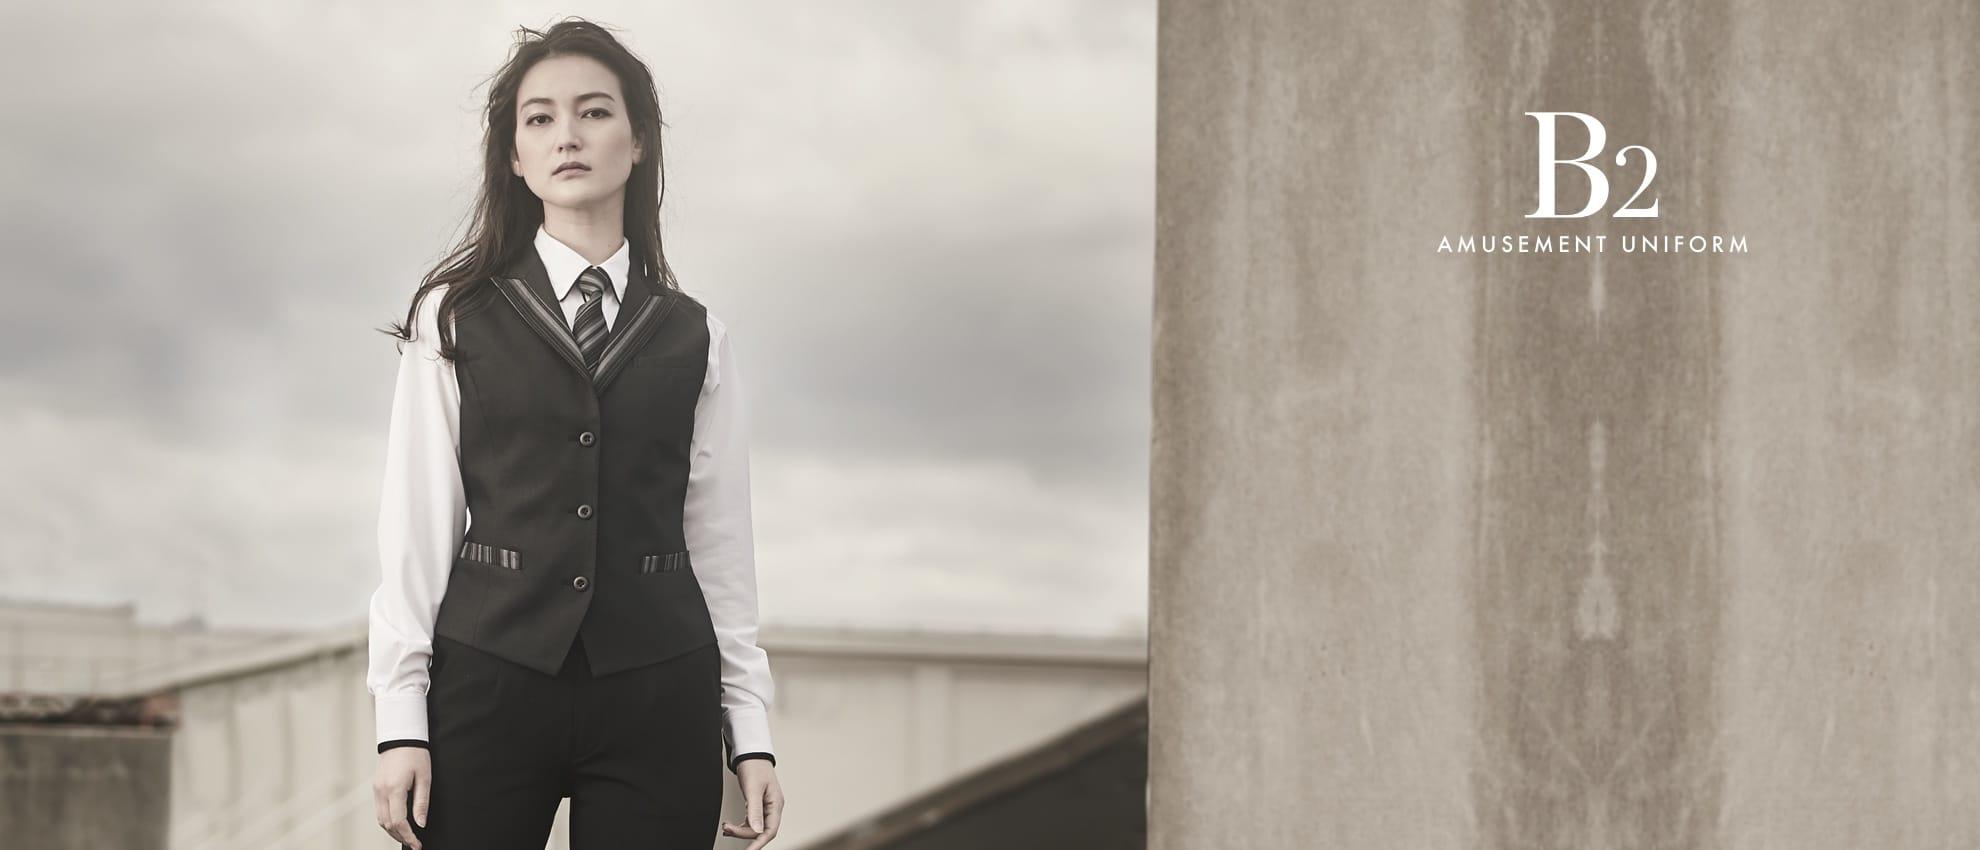 B2 - Amusement Uniform |Boston Group - Japan